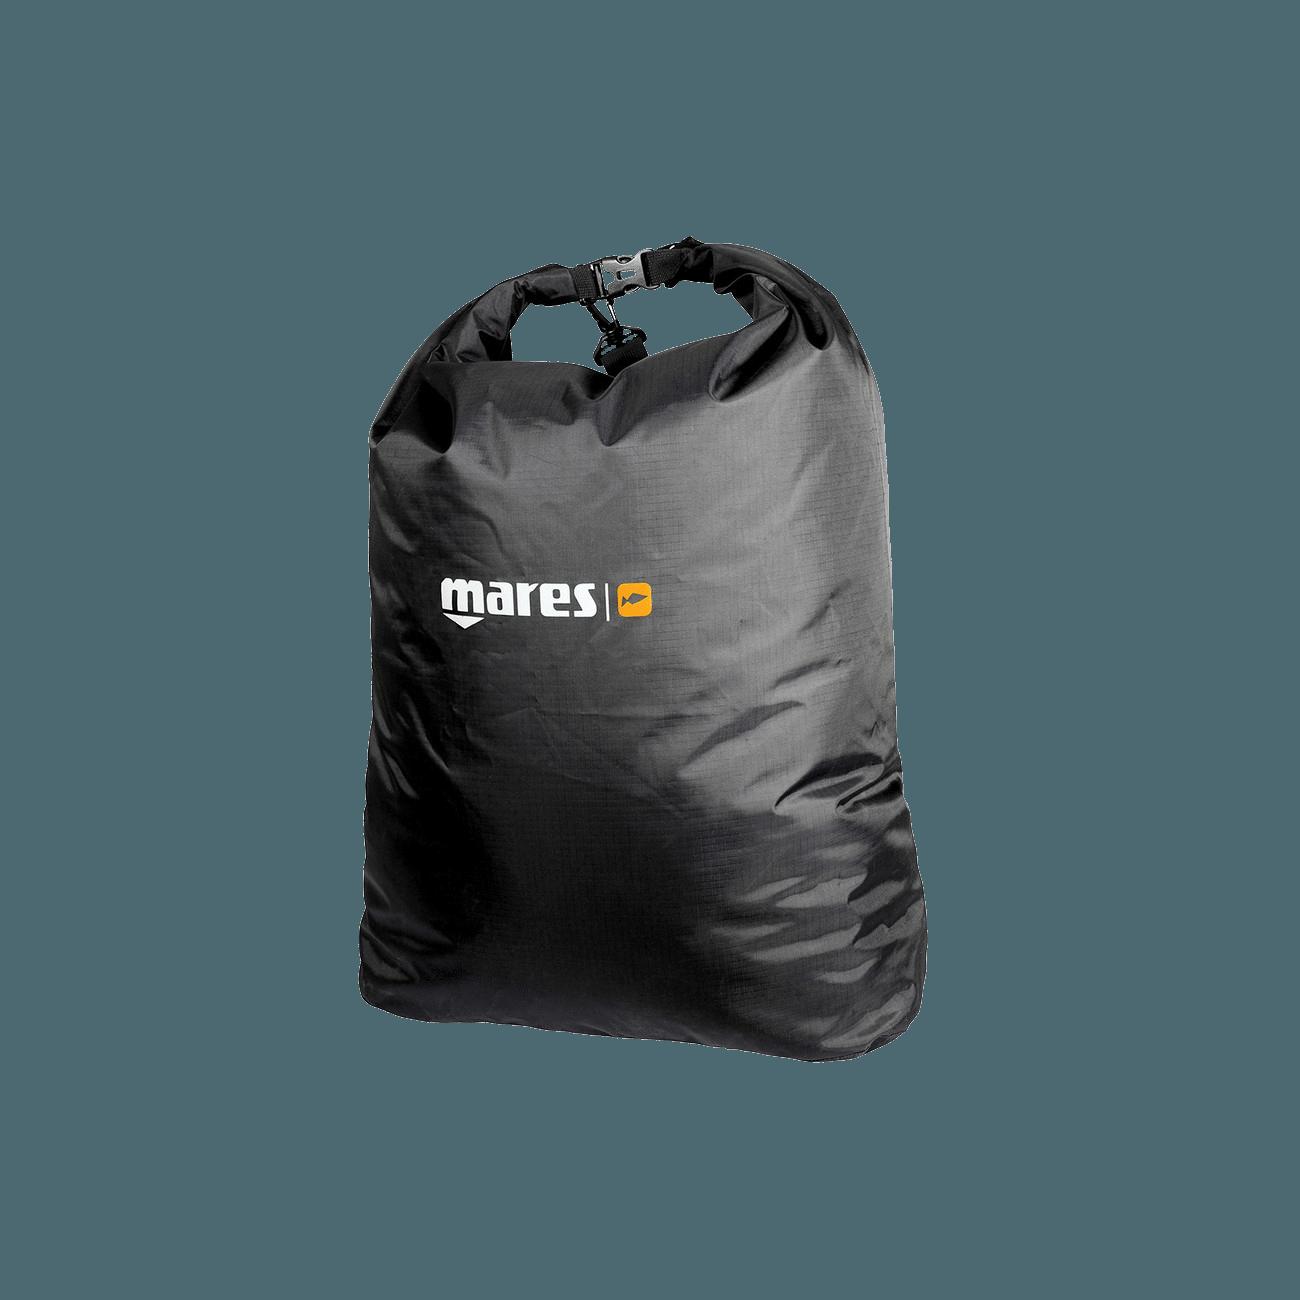 Mares Dry Bag | Mares Bags | Mares Singapore